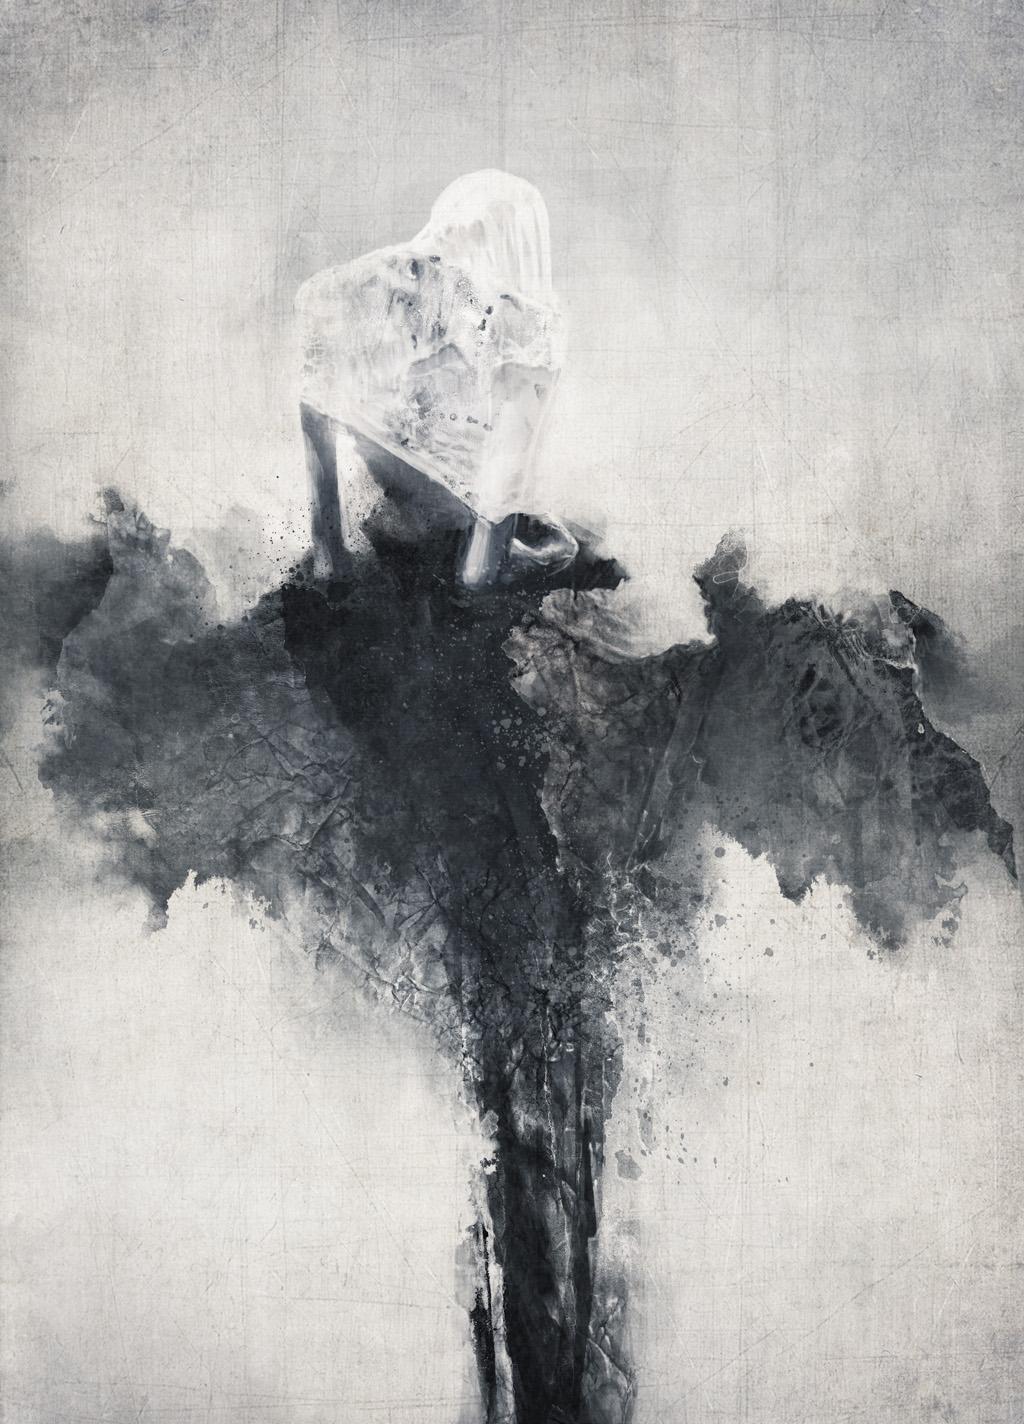 Jarek Kubicki / www.artophilia.com